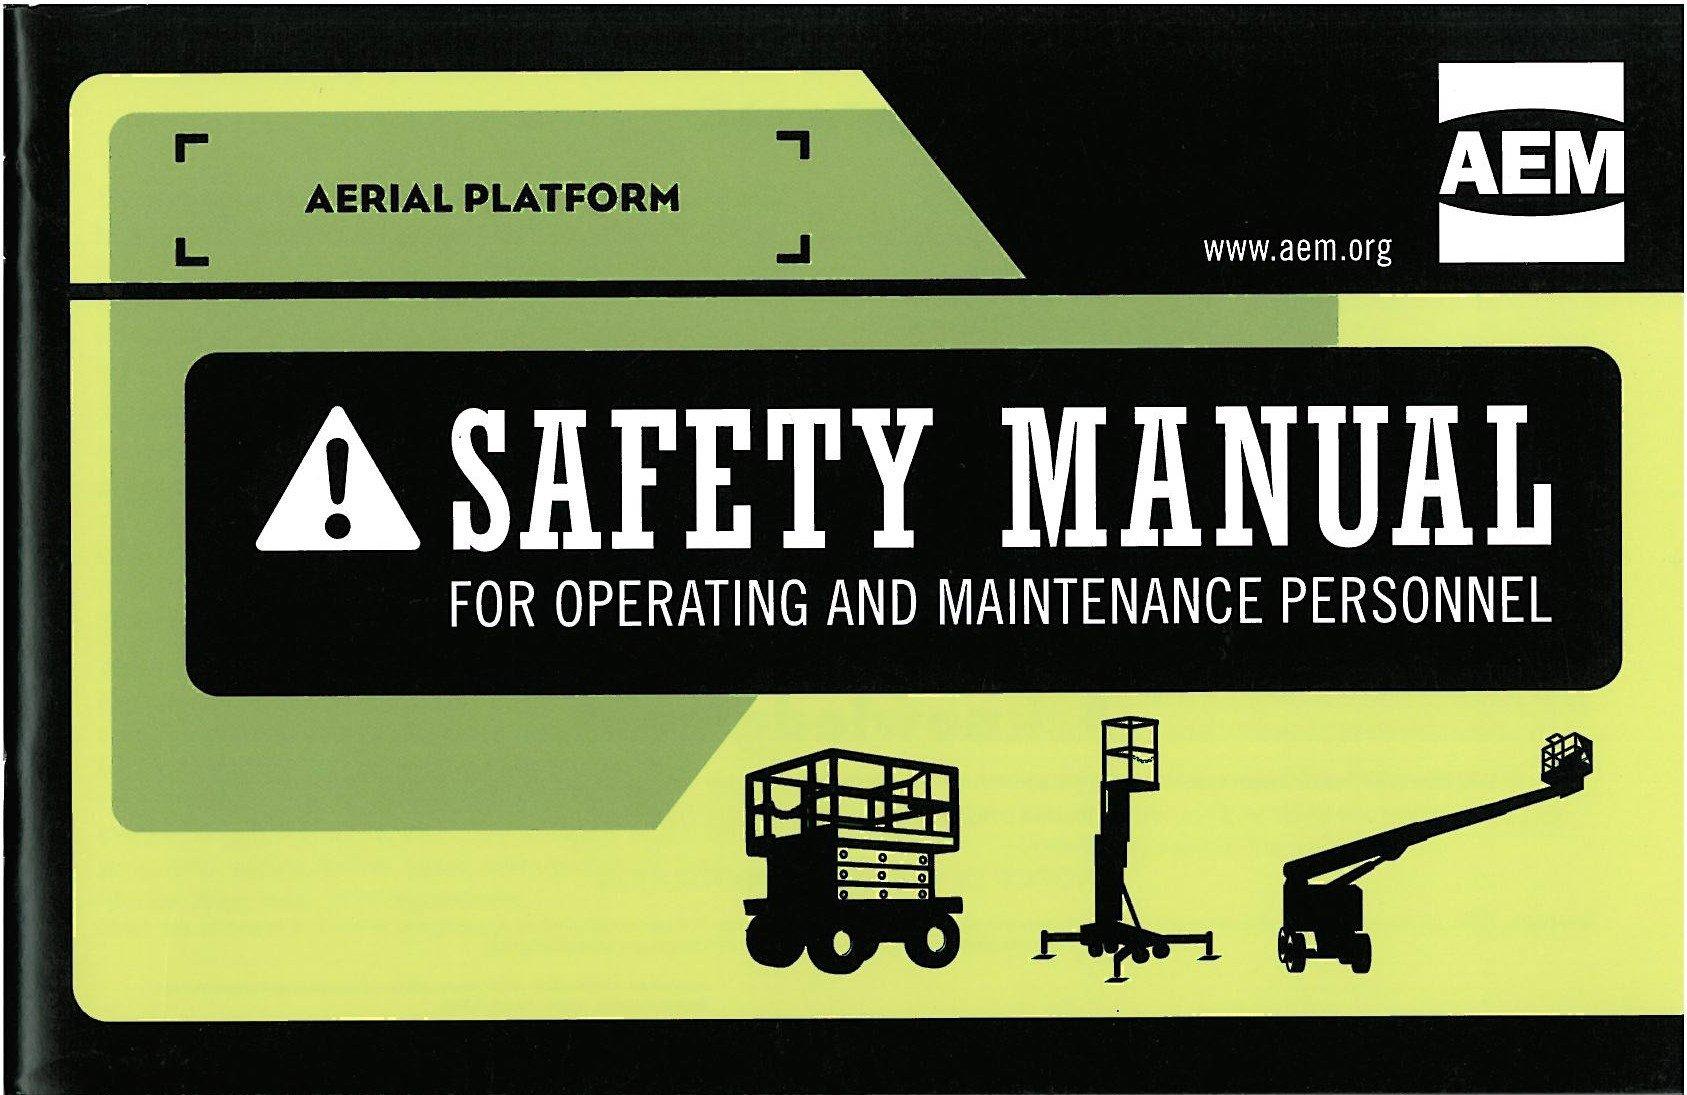 Aerial Platform Safety Manual Safety, Manual, Work platform